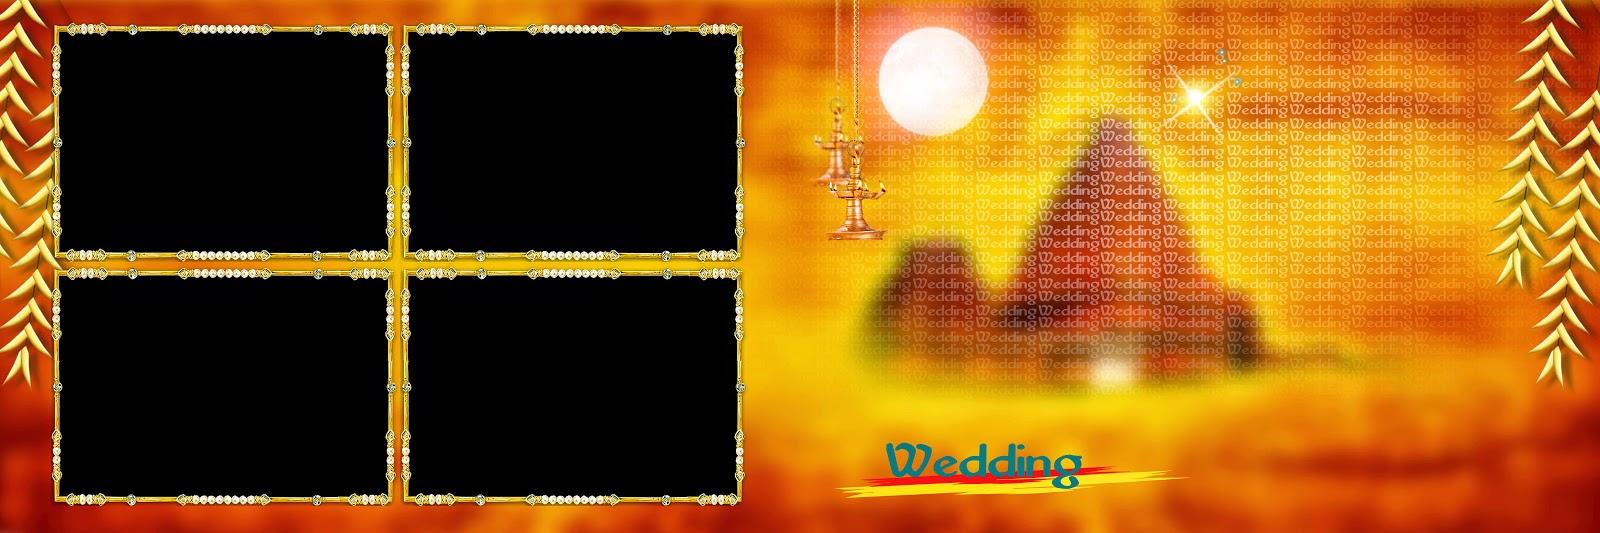 12x36 Wedding Album Psd Free 4